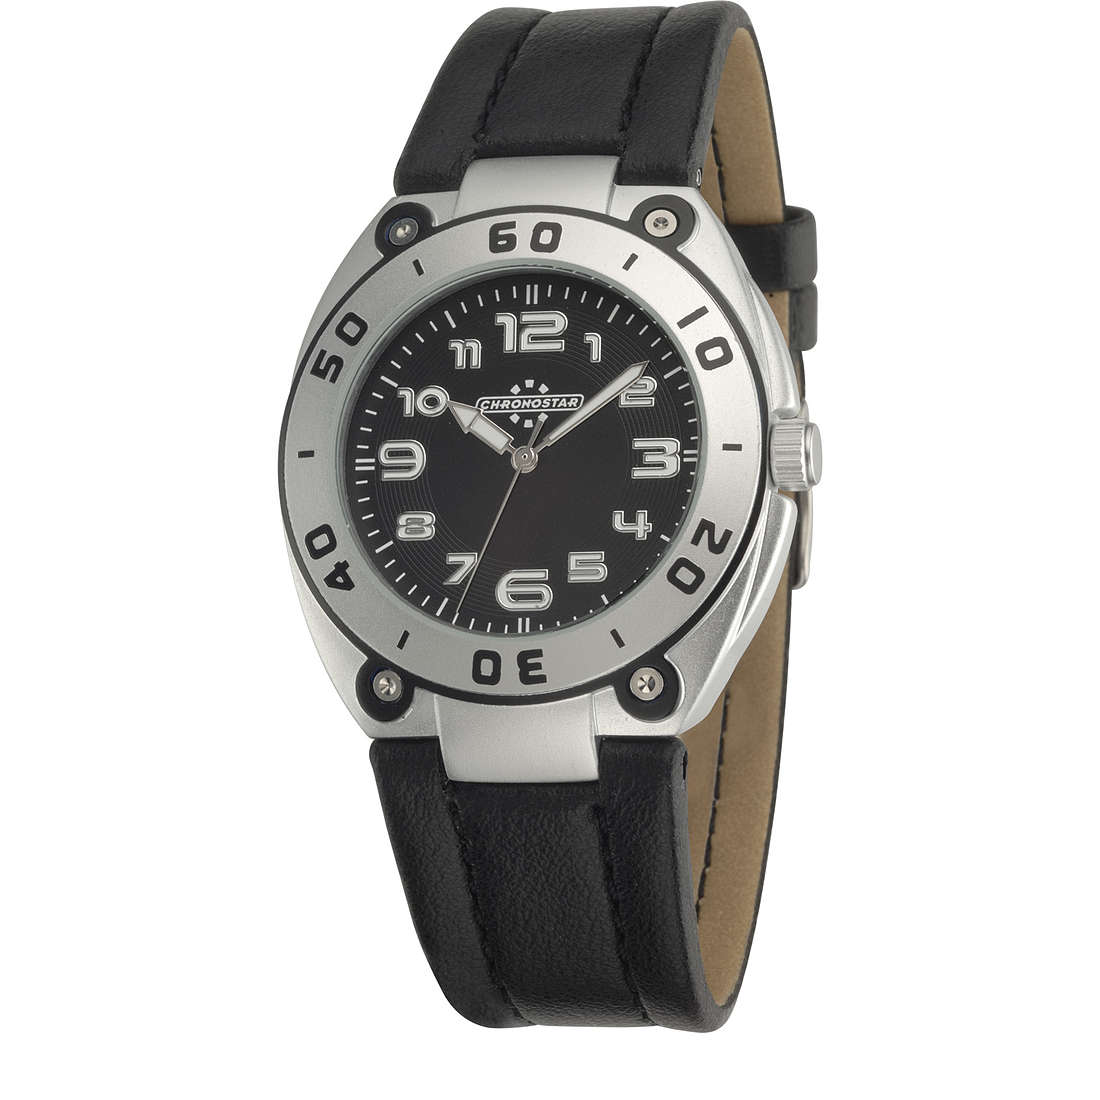 montre seul le temps femme Chronostar Alluminium R3751224003